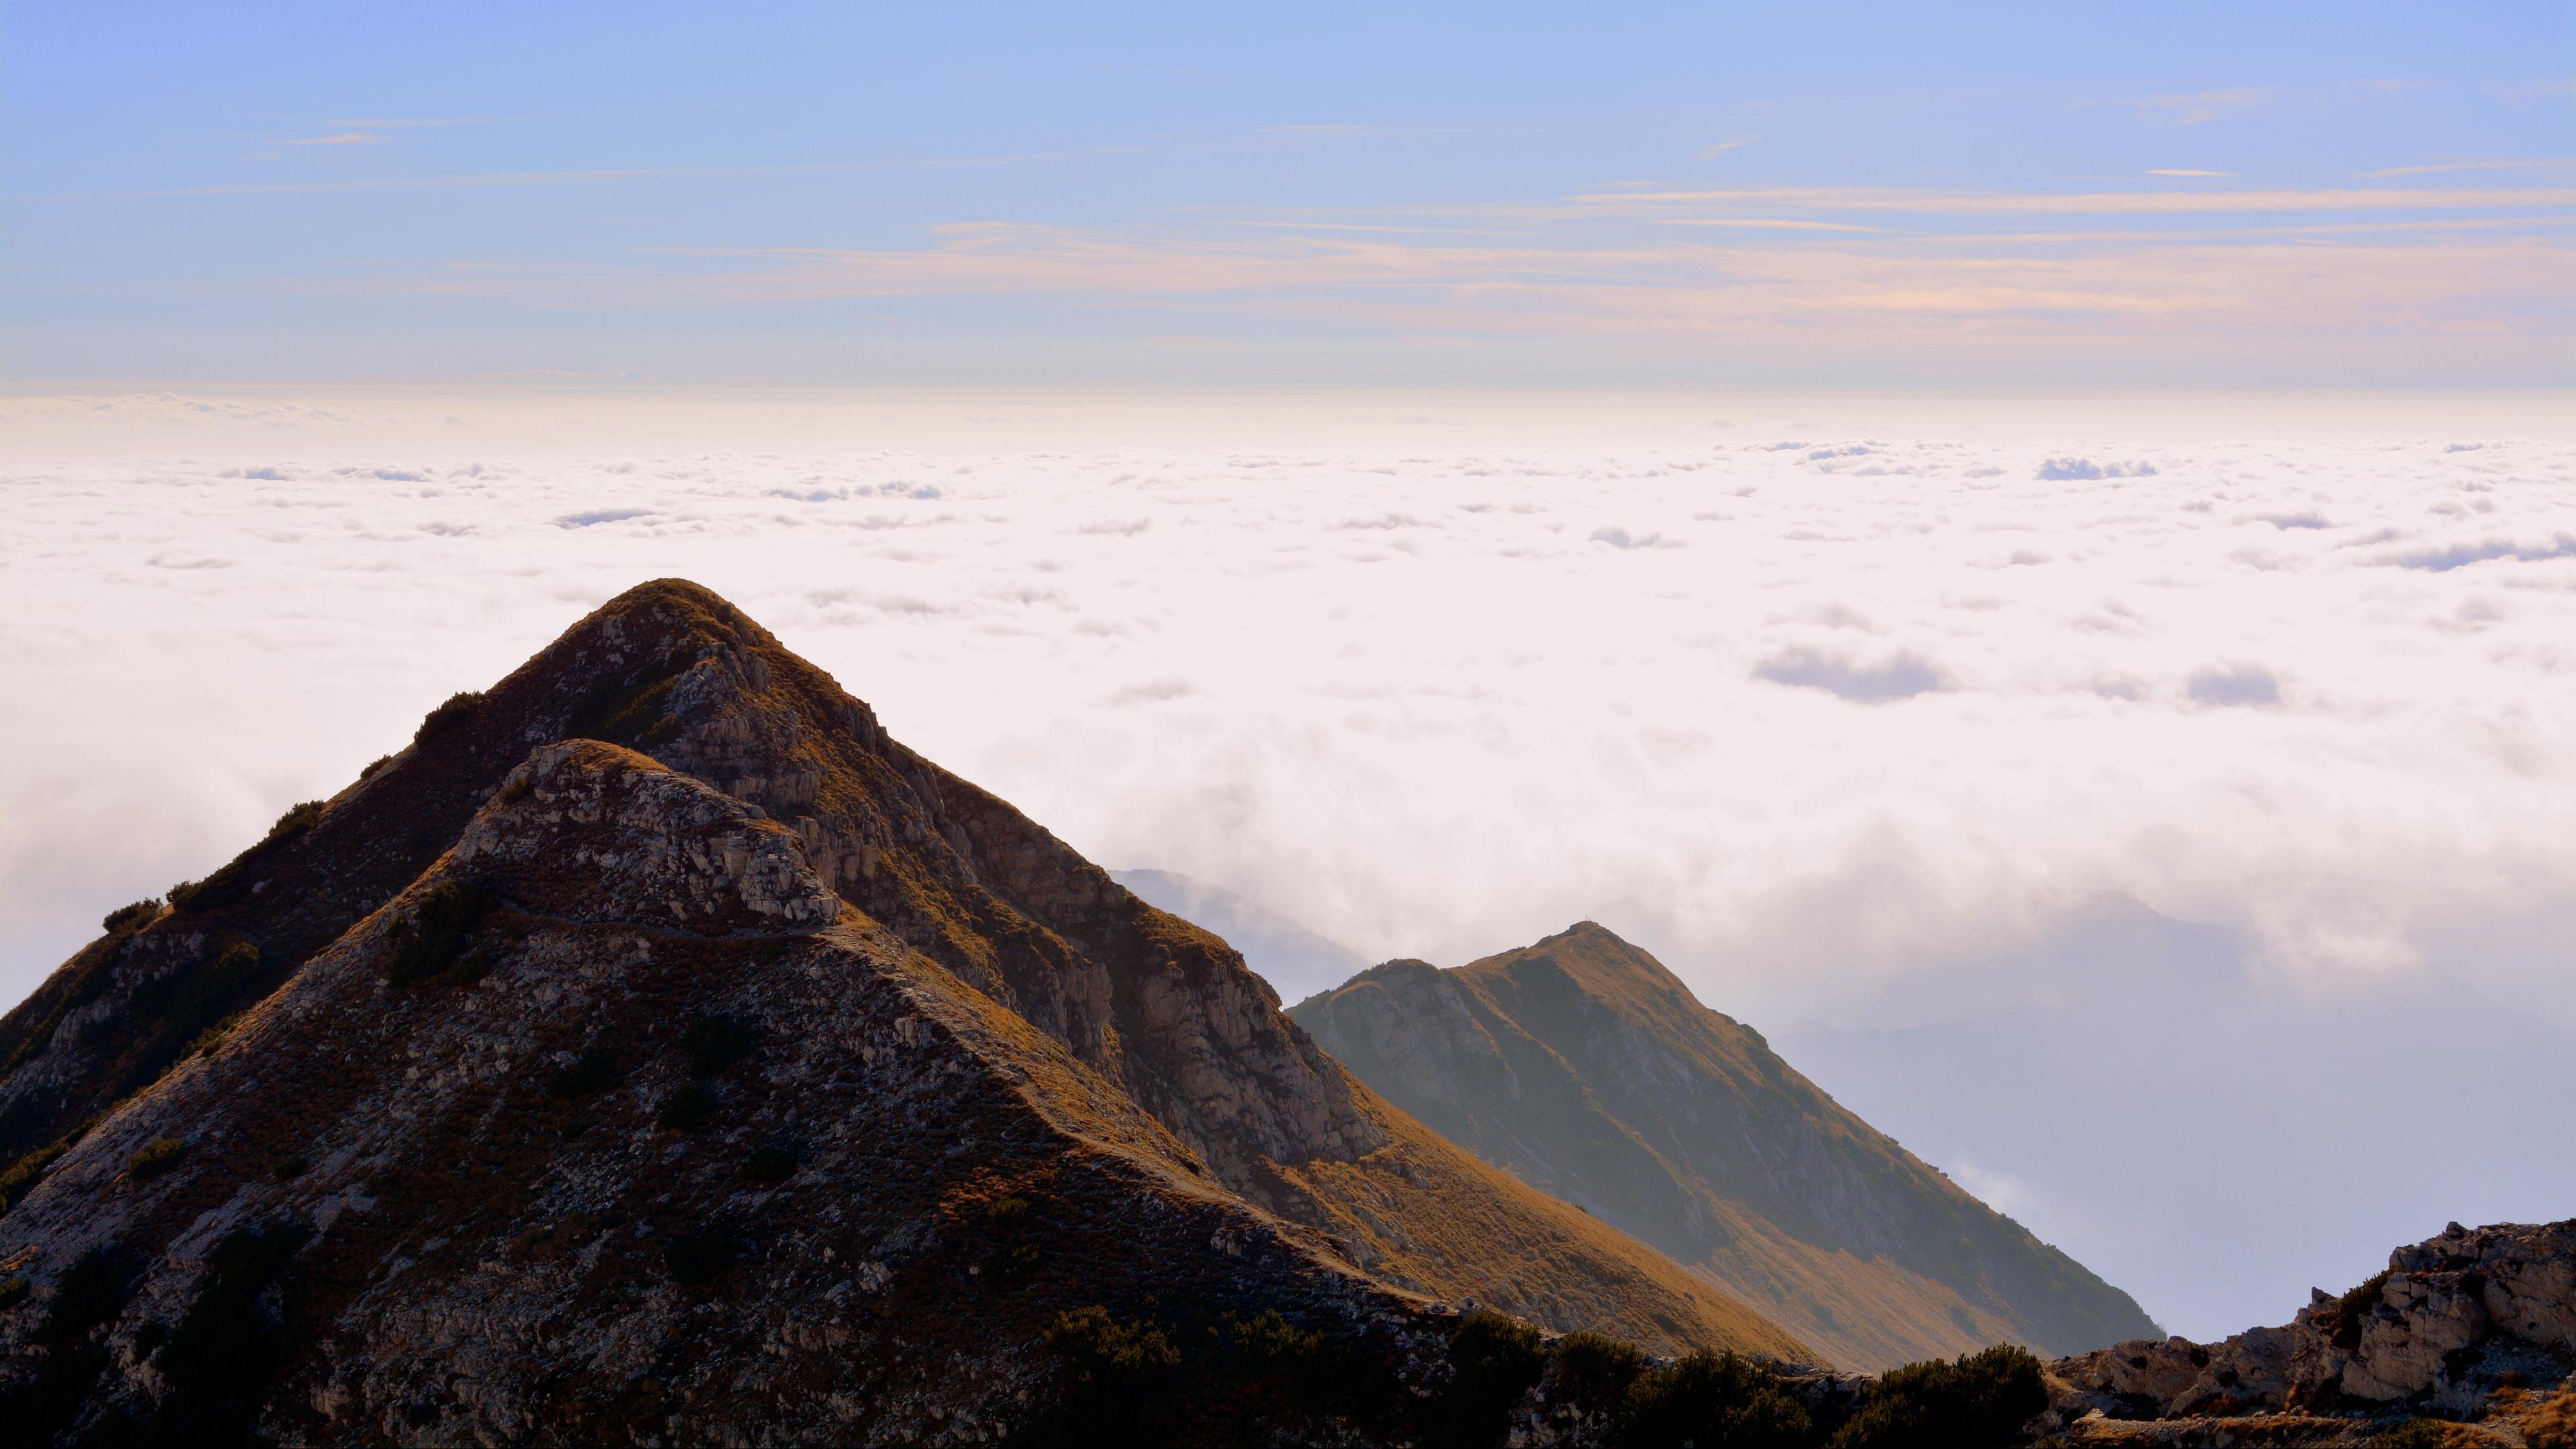 mountain top sky clouds carrega ligure italy 4k 1541116281 - mountain, top, sky, clouds, carrega ligure, italy 4k - top, Sky, Mountain